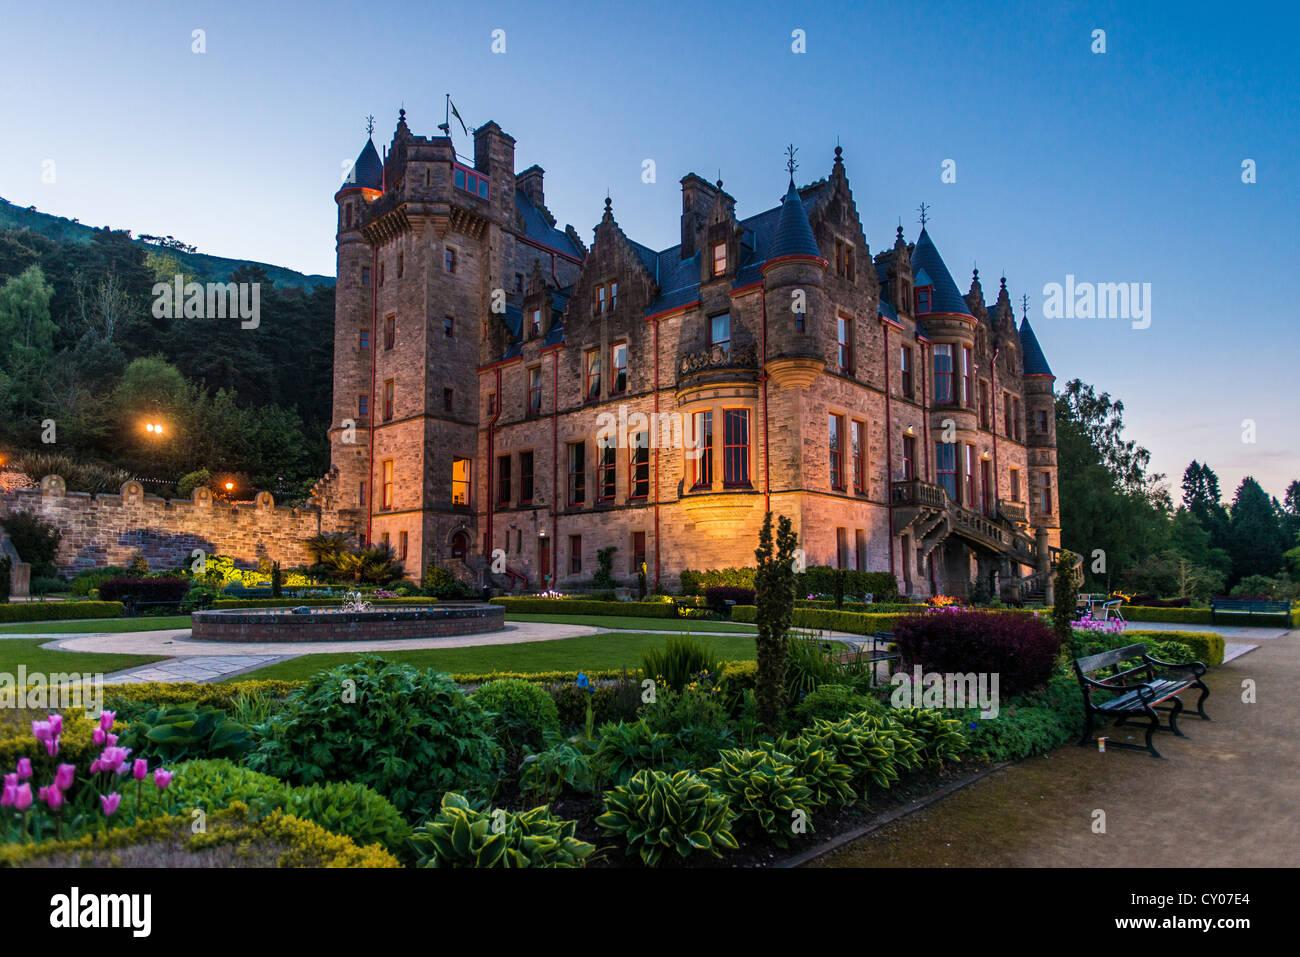 Belfast Castle, Belfast, Northern Ireland, United Kingdom, Europe - Stock Image